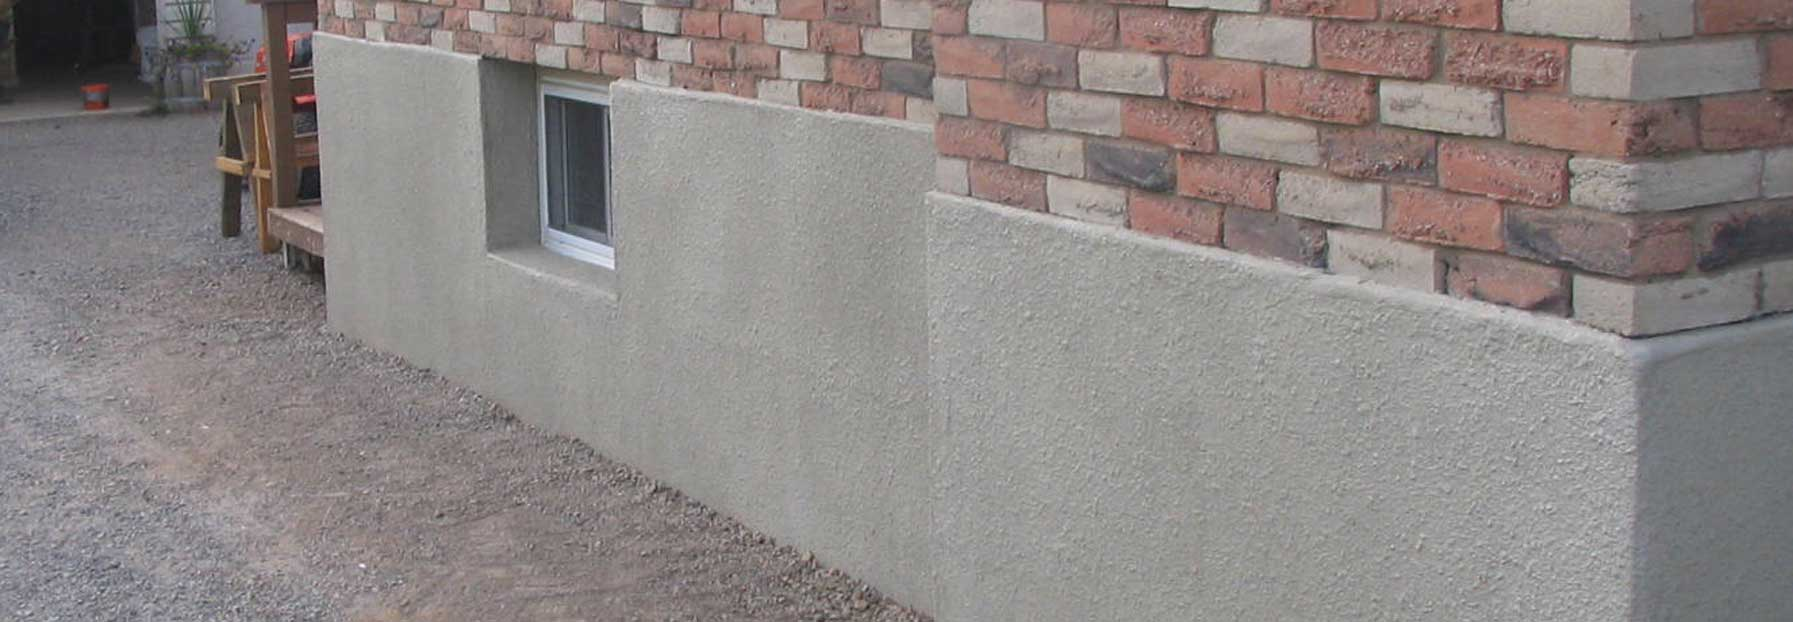 parging foundation repair